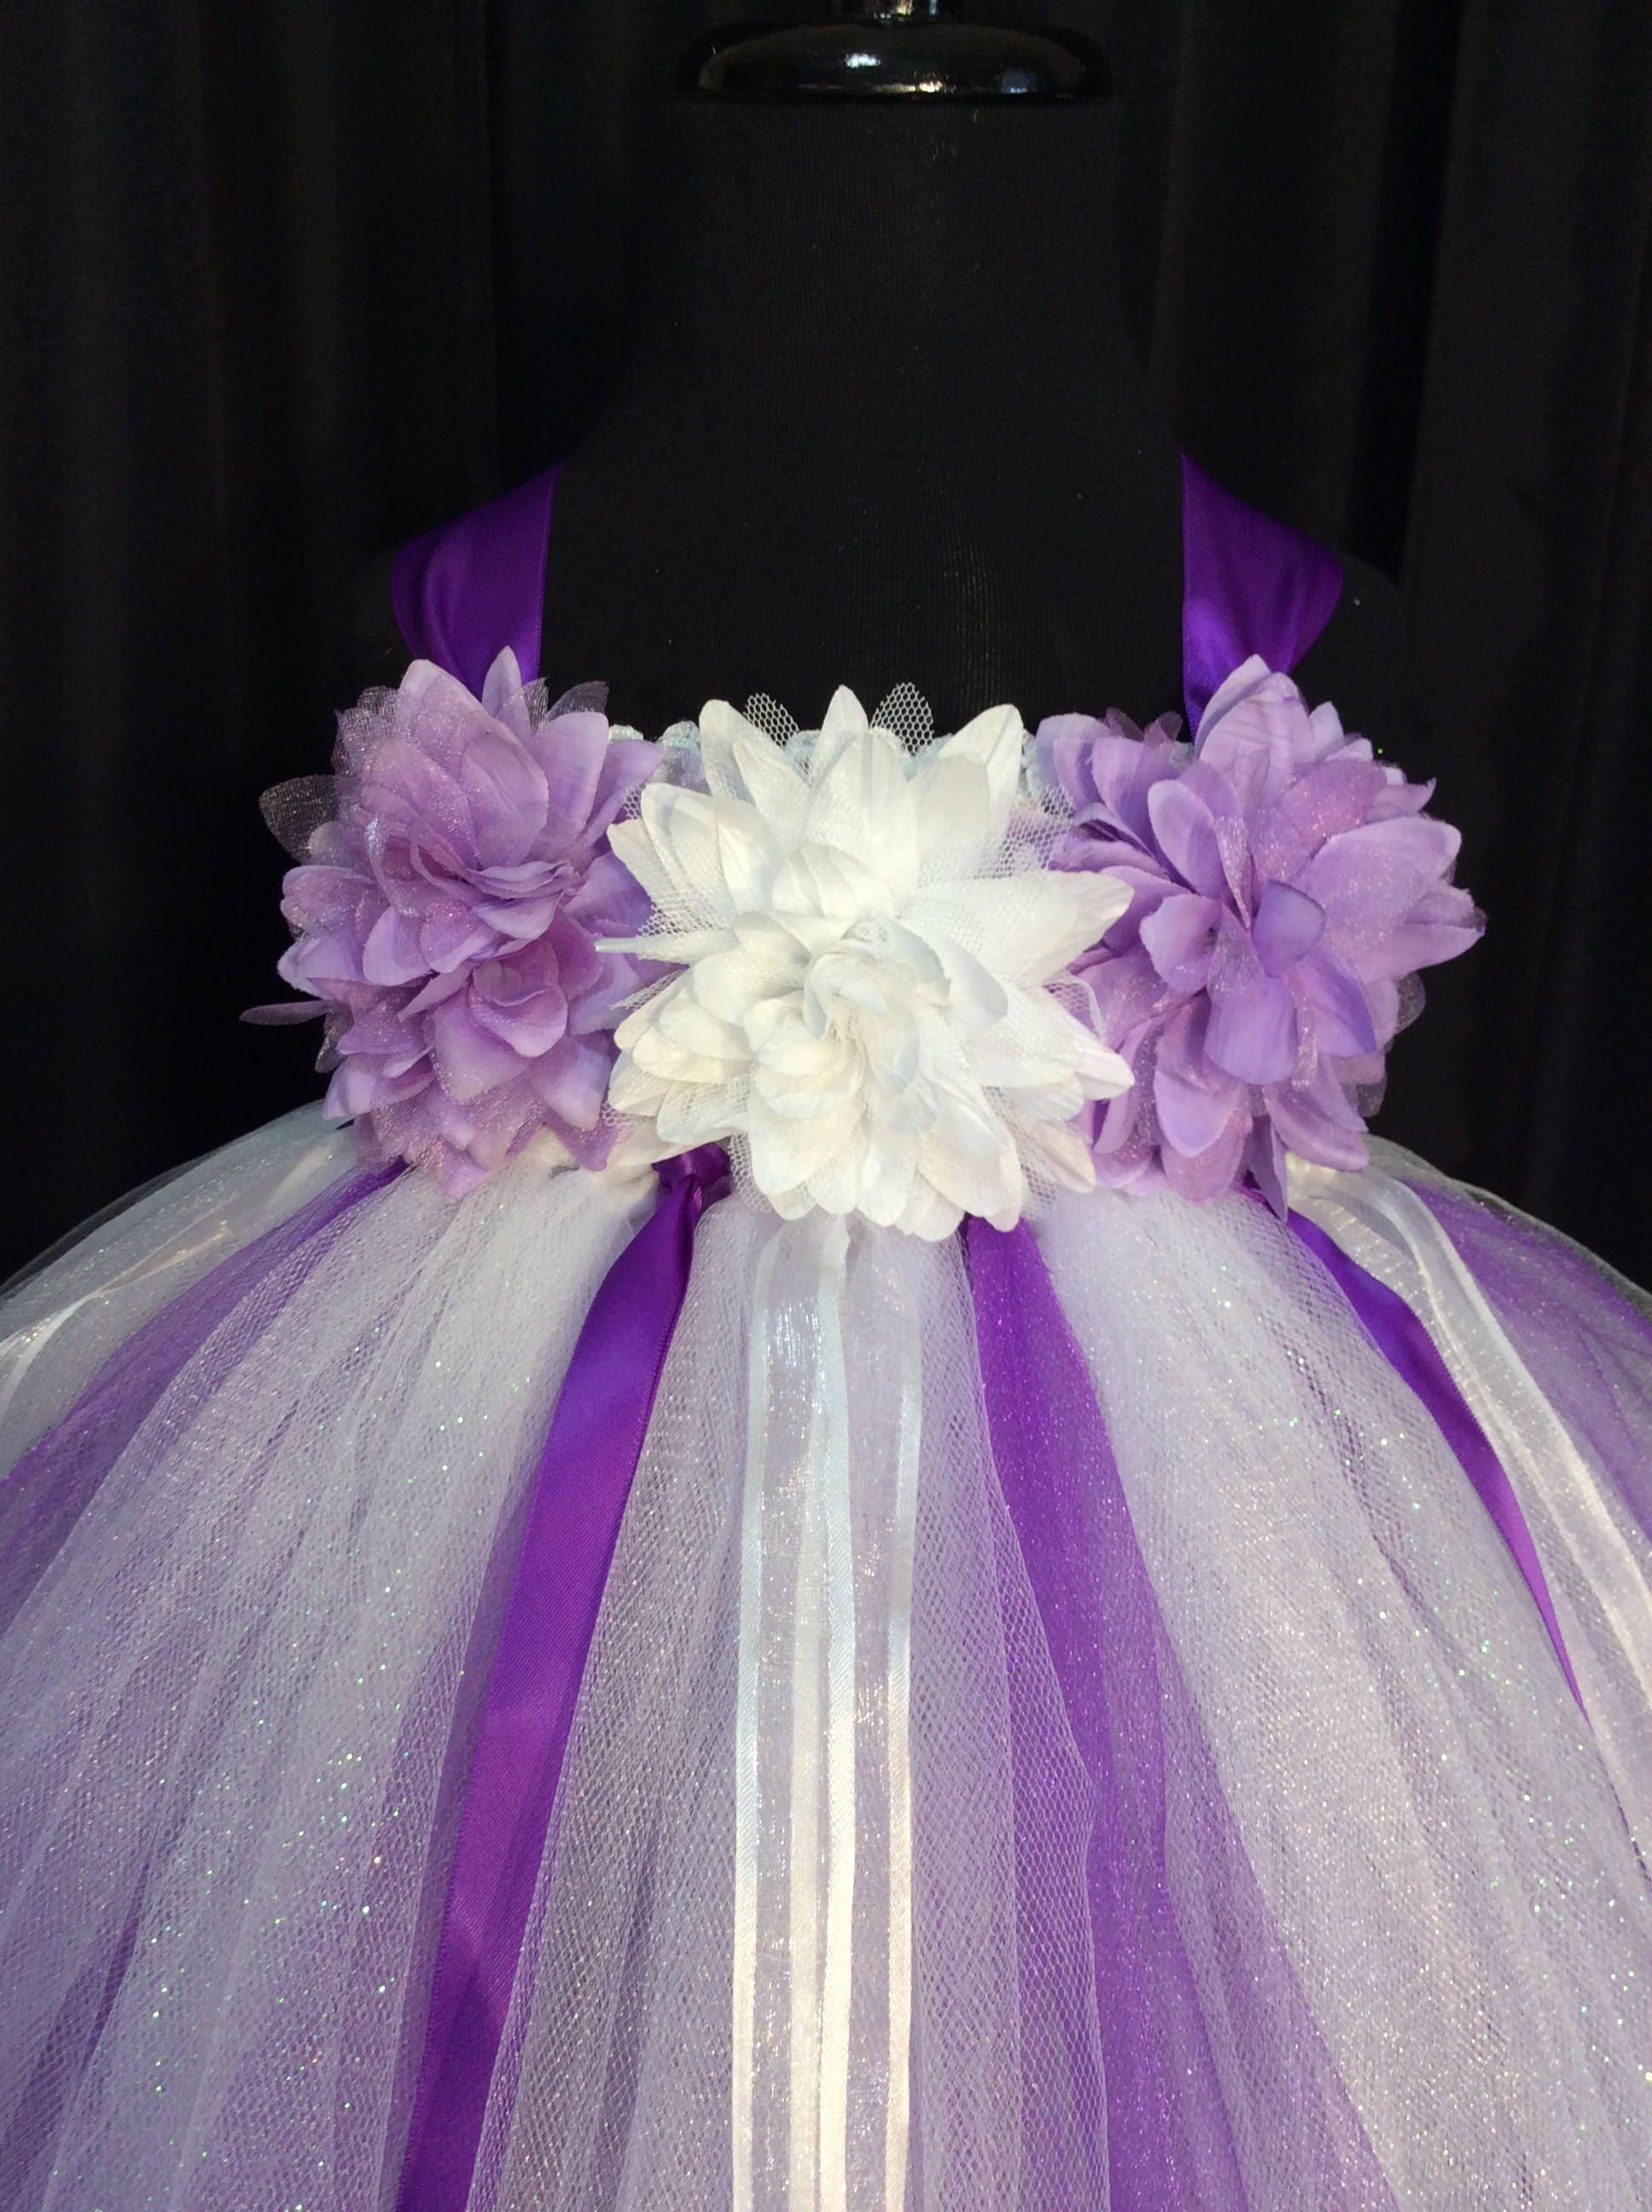 White and purple flower girl dress tulle flower girl dress tutu white flower girl dress gallery photo gallery photo gallery photo mightylinksfo